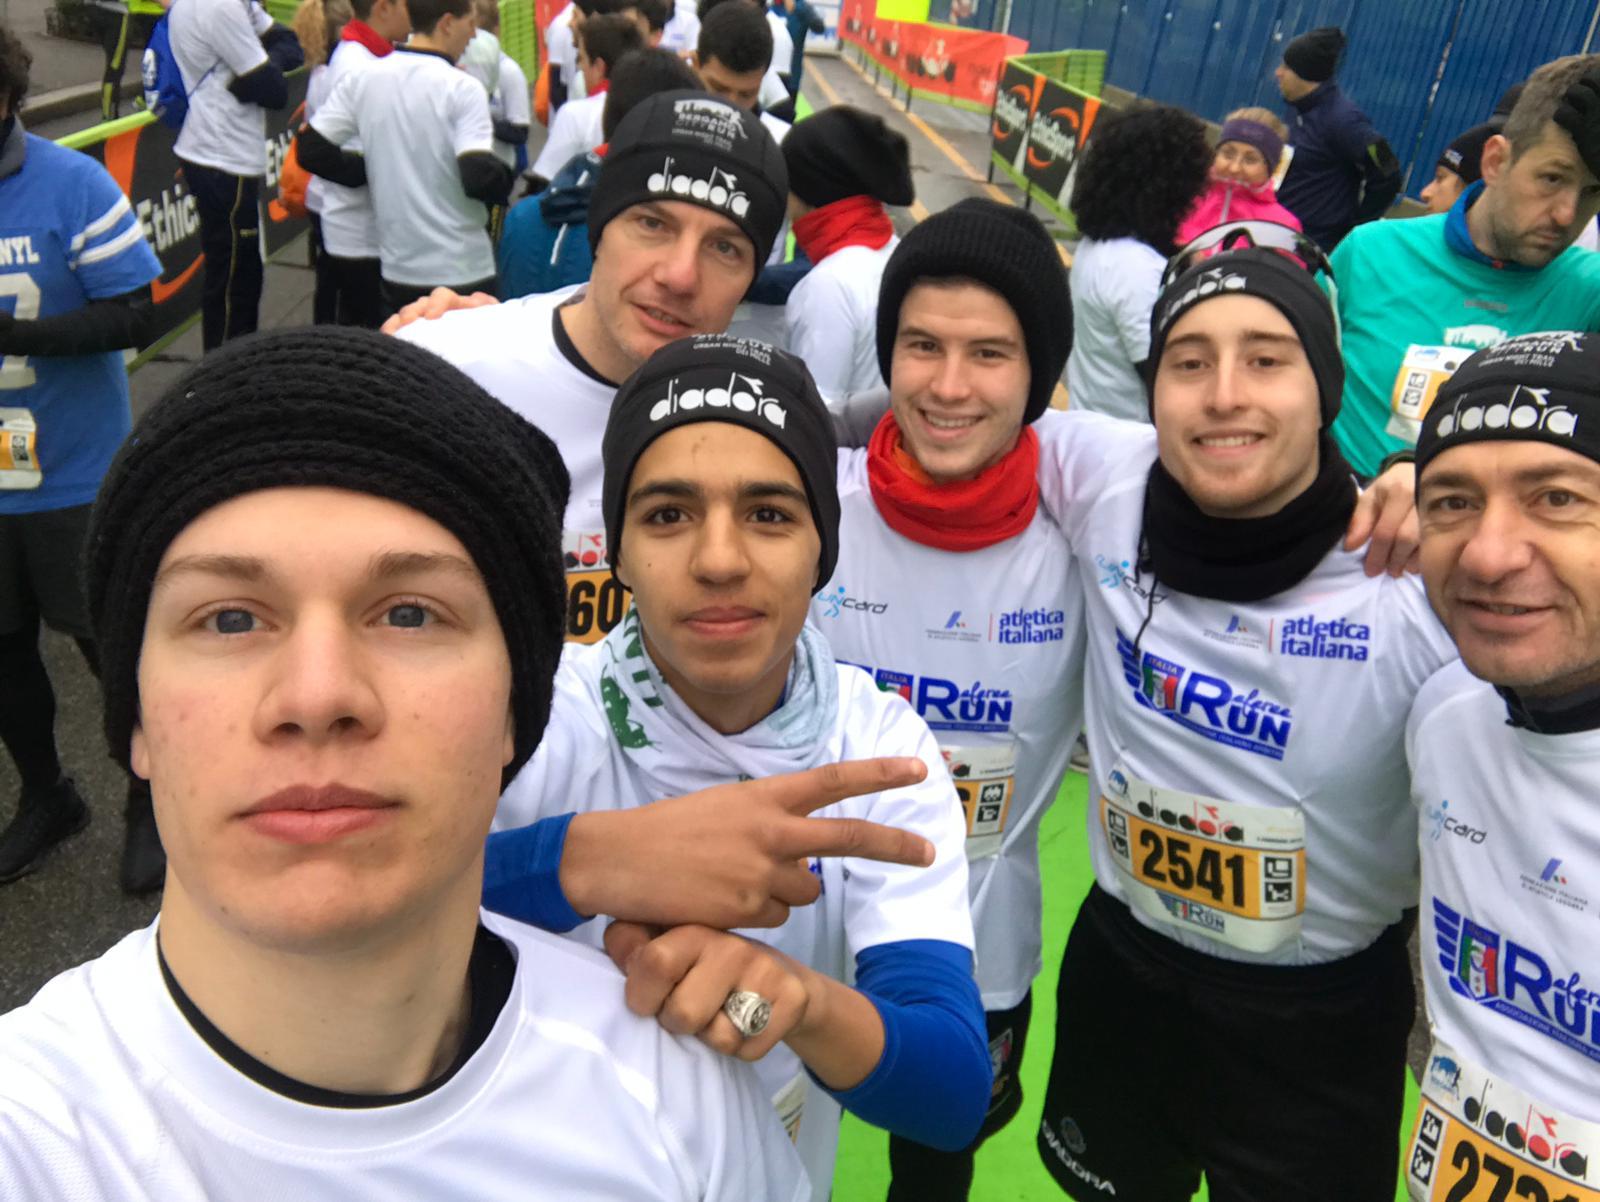 referee run 2019 bergamo sondrio